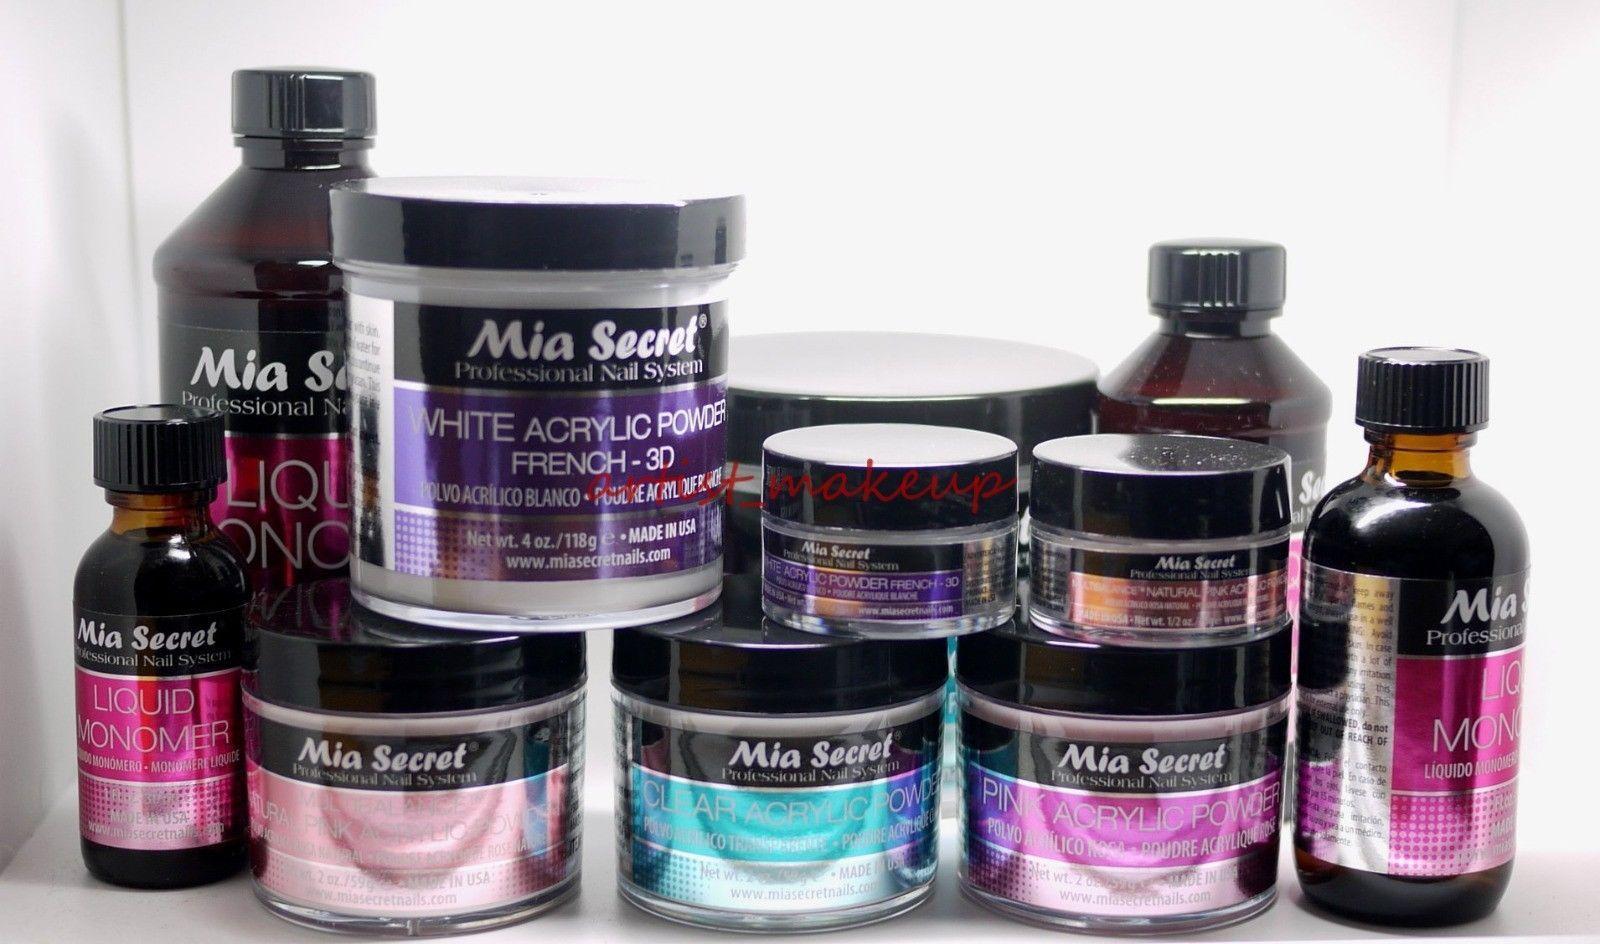 Mia Secret Liquid Monomer Acrylic Powder Set Choose Your Set Ebay Acrylic Powder Acrylic Nail Kit Acrylic Nail Powder